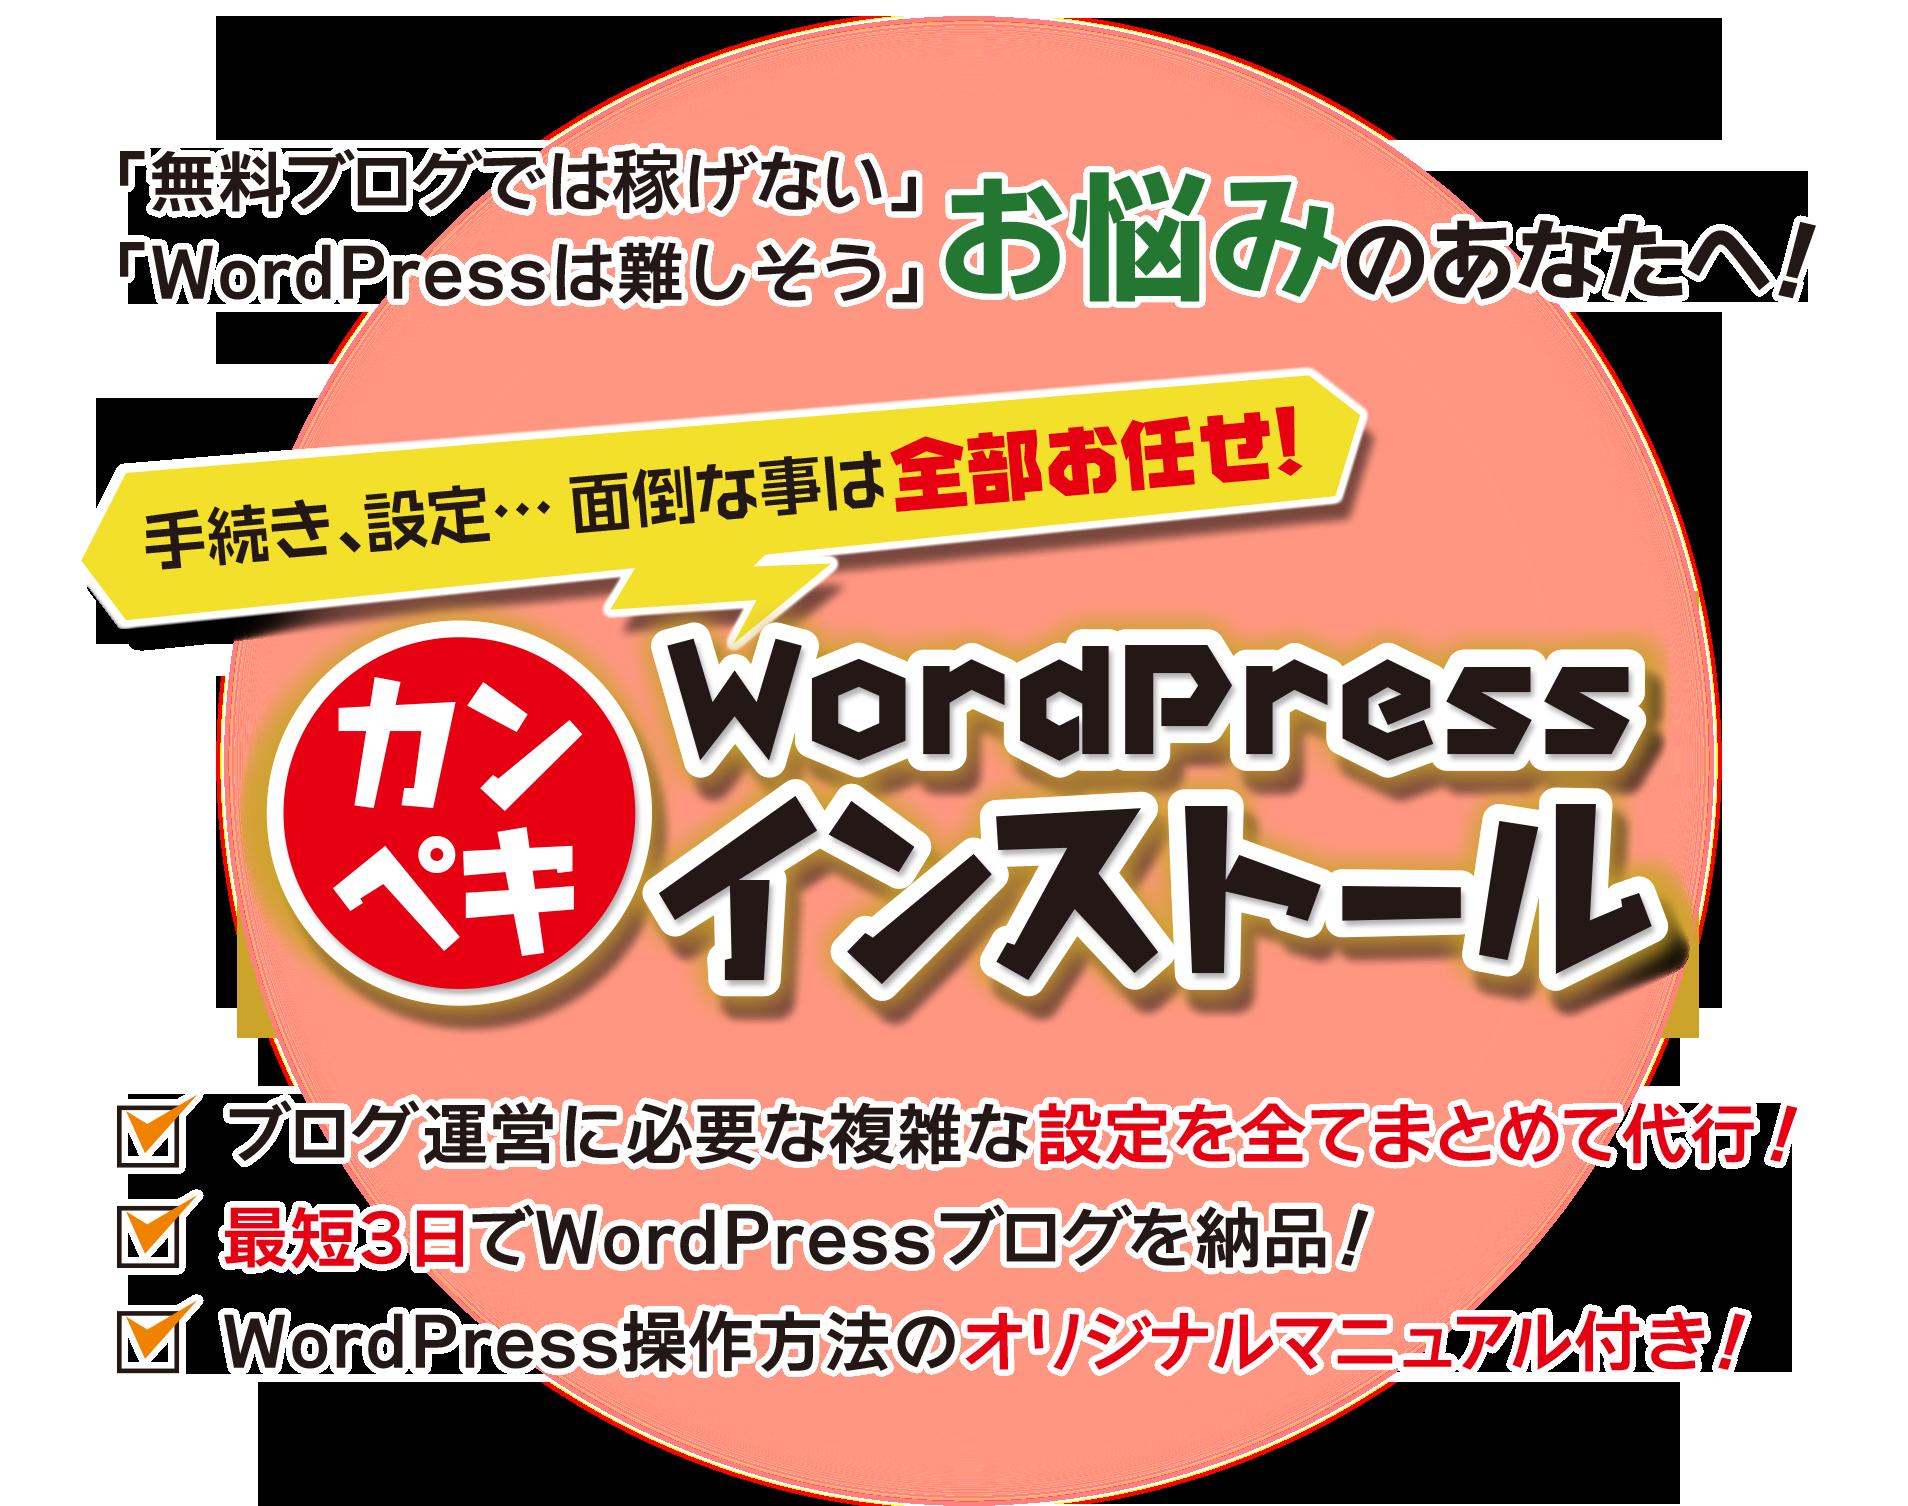 WordPressインストール・設定代行